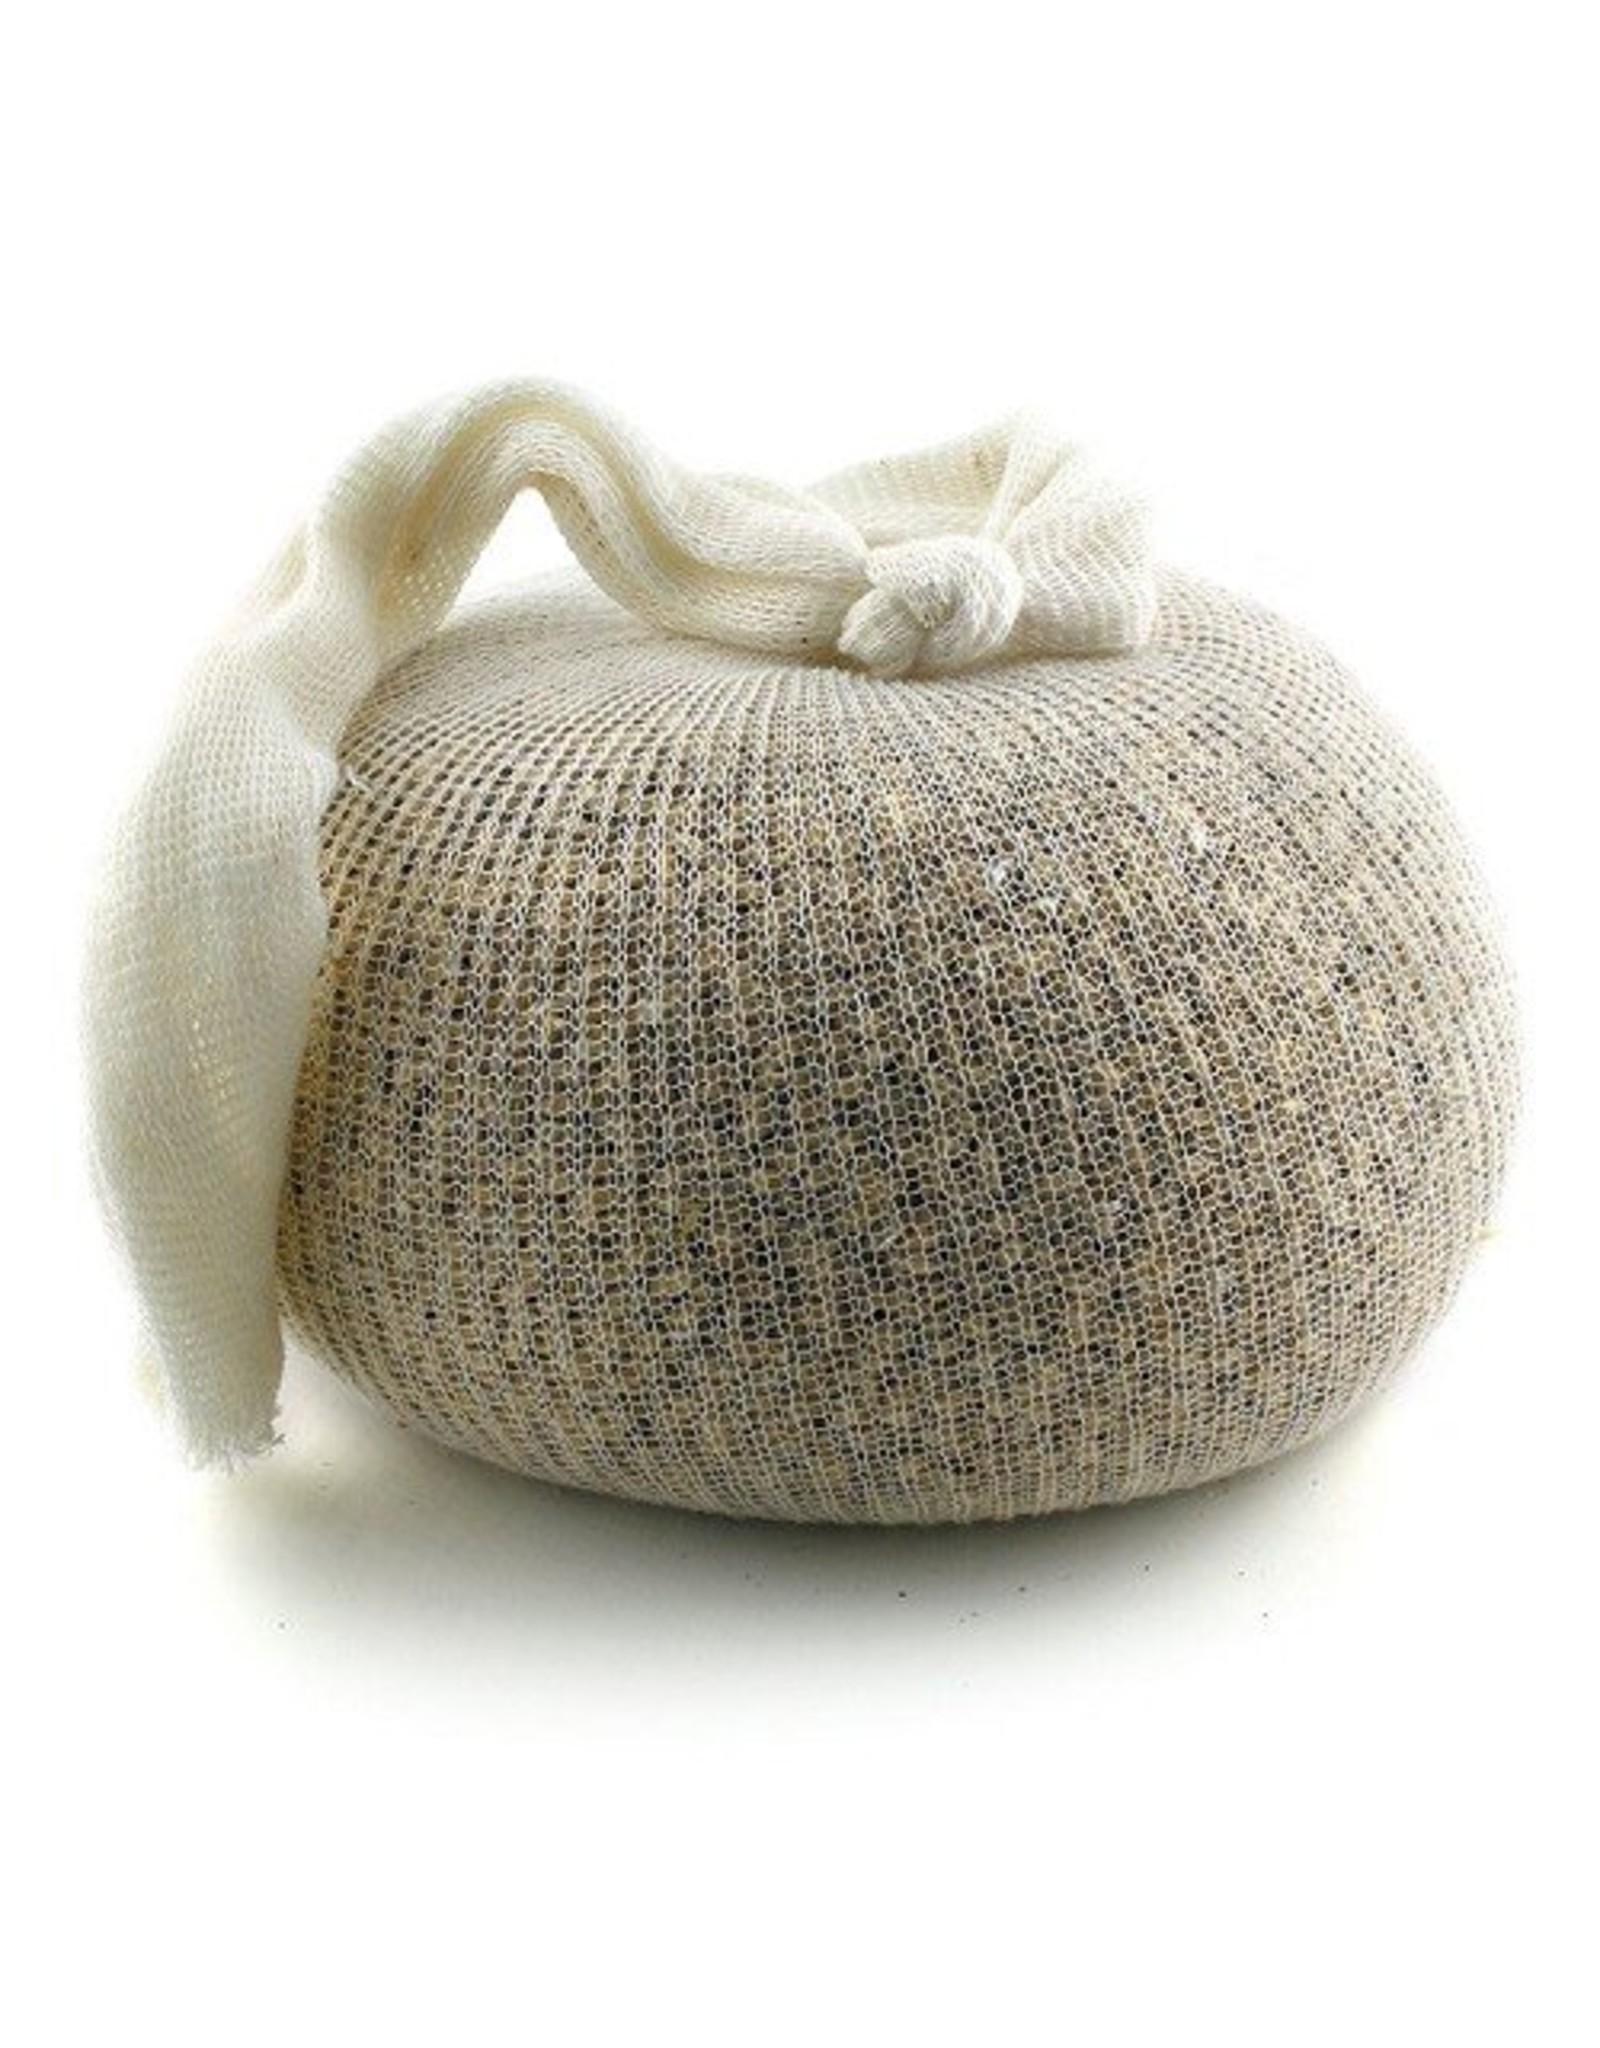 "PHO PHO Muslin Bag Small (100 pack) 14"""